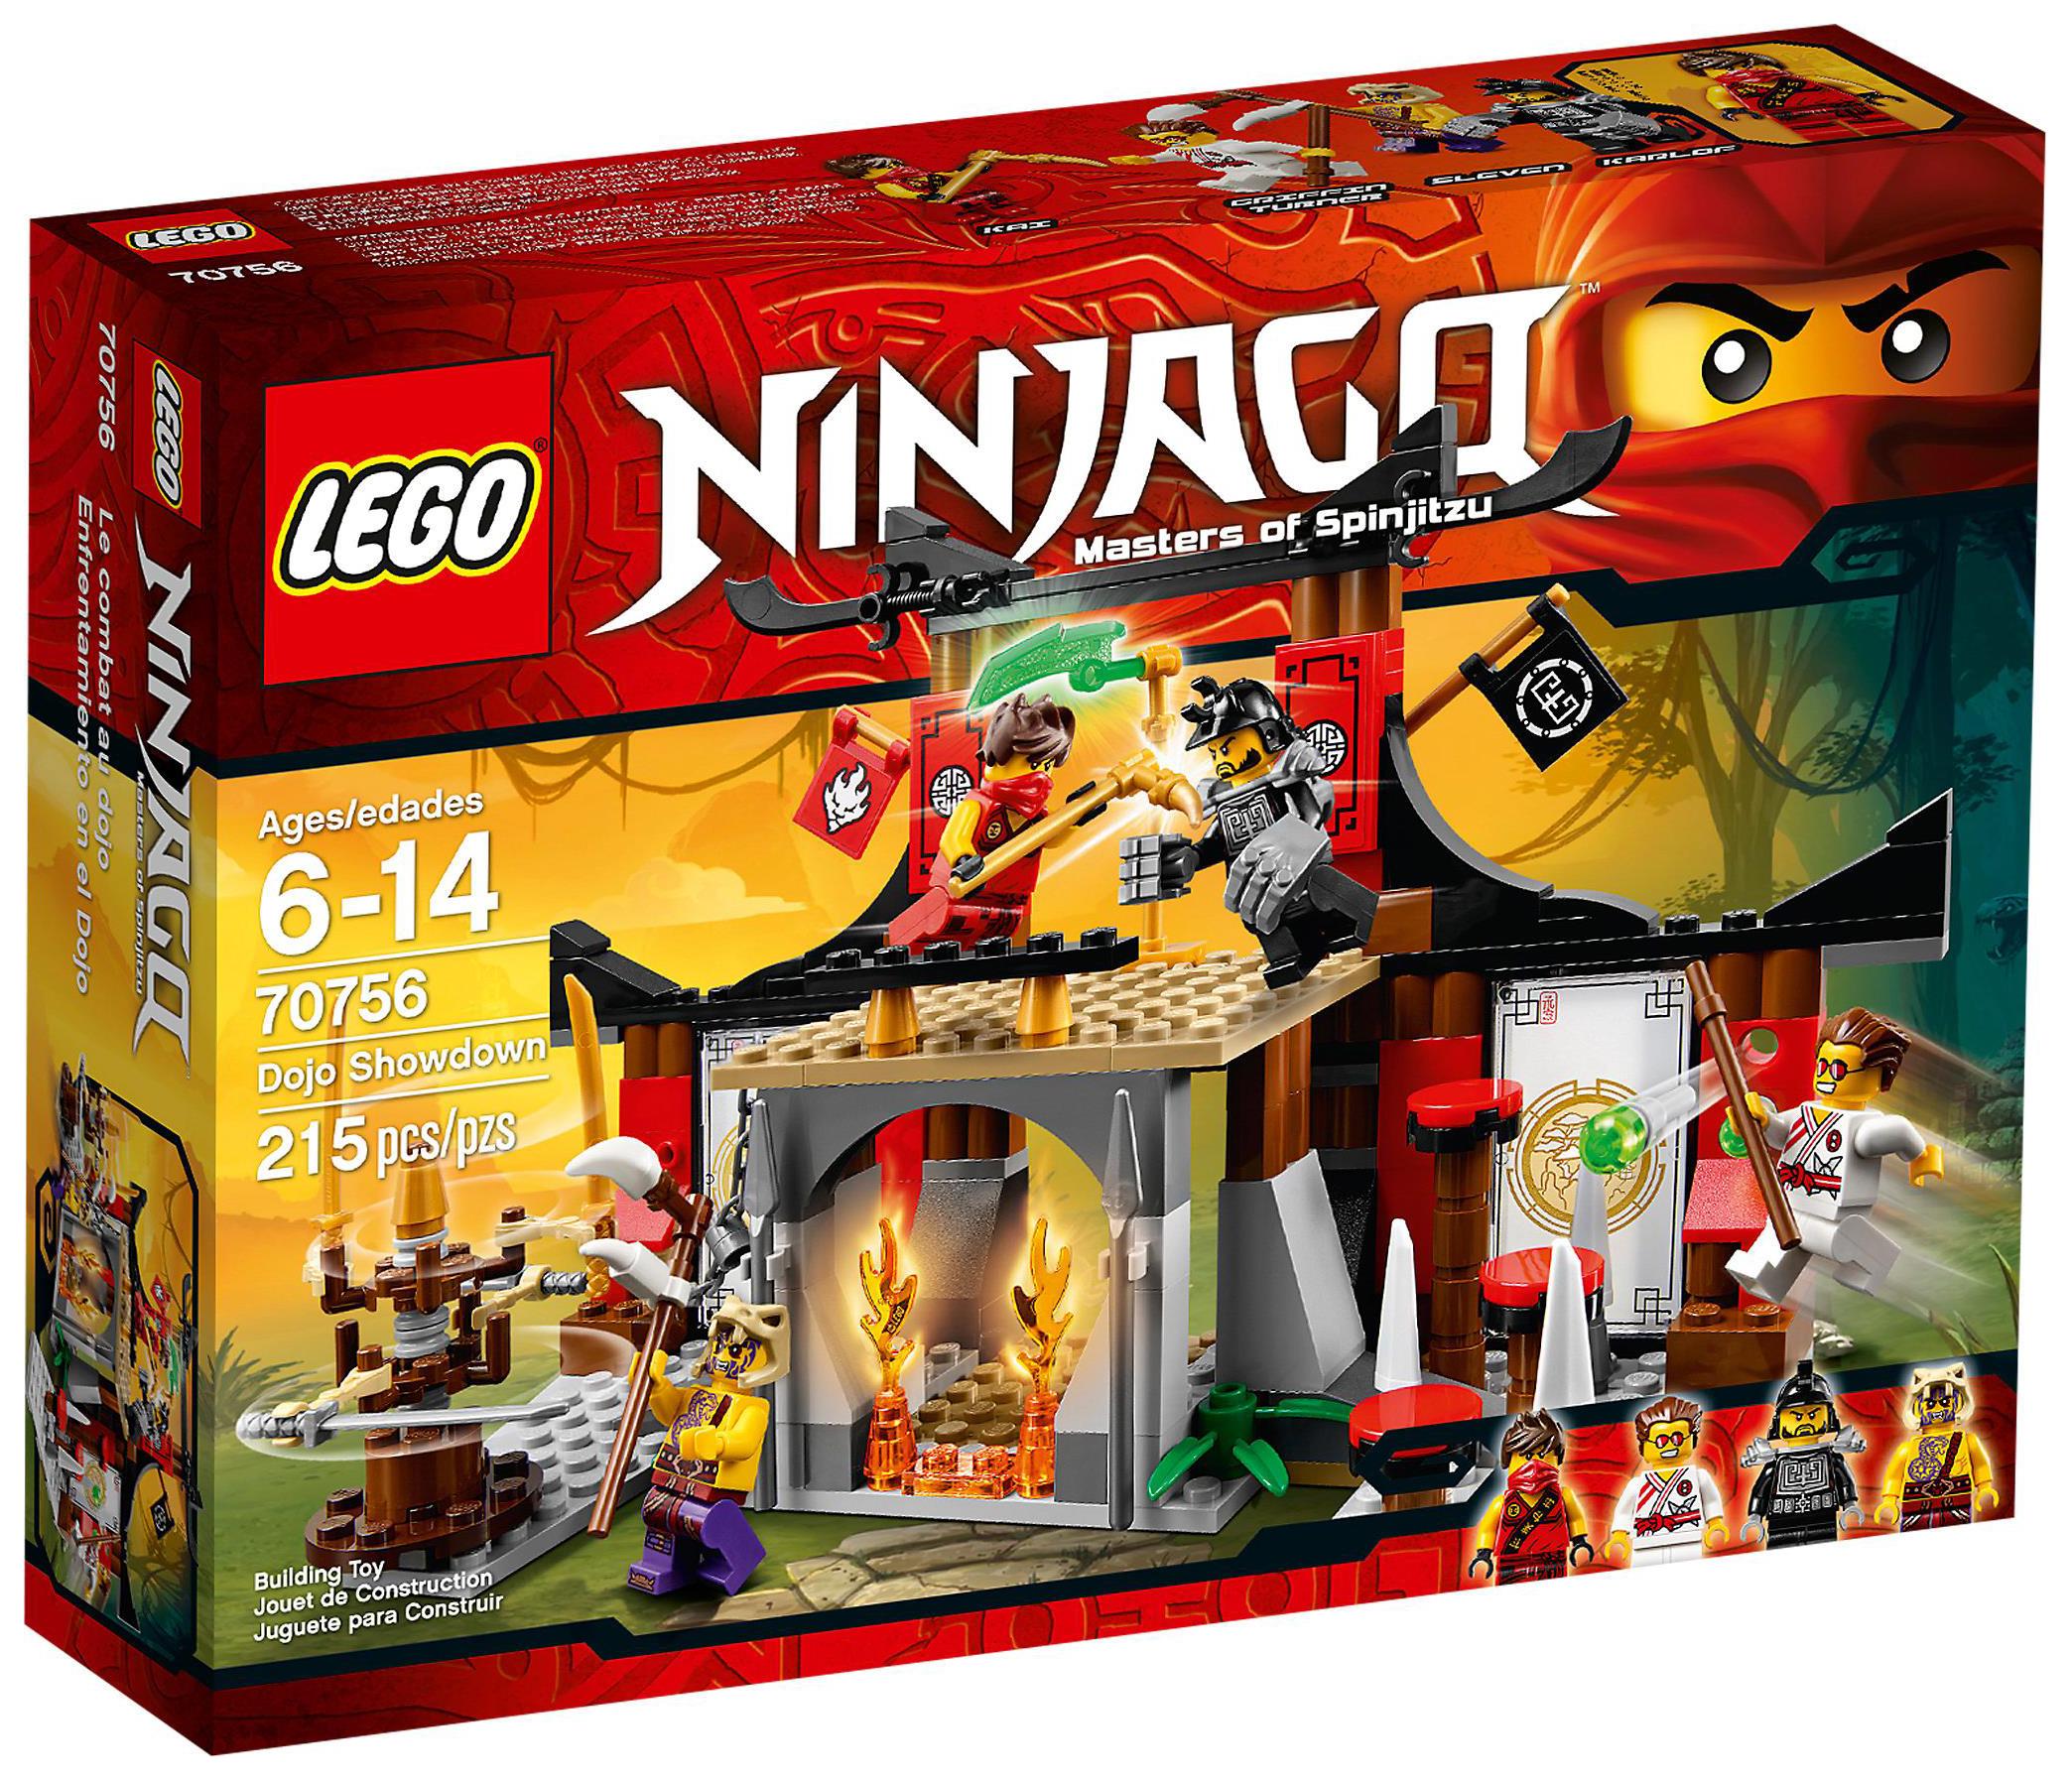 Lego ninjago 70756 pas cher le combat au dojo - Lego ninjago 4 ...